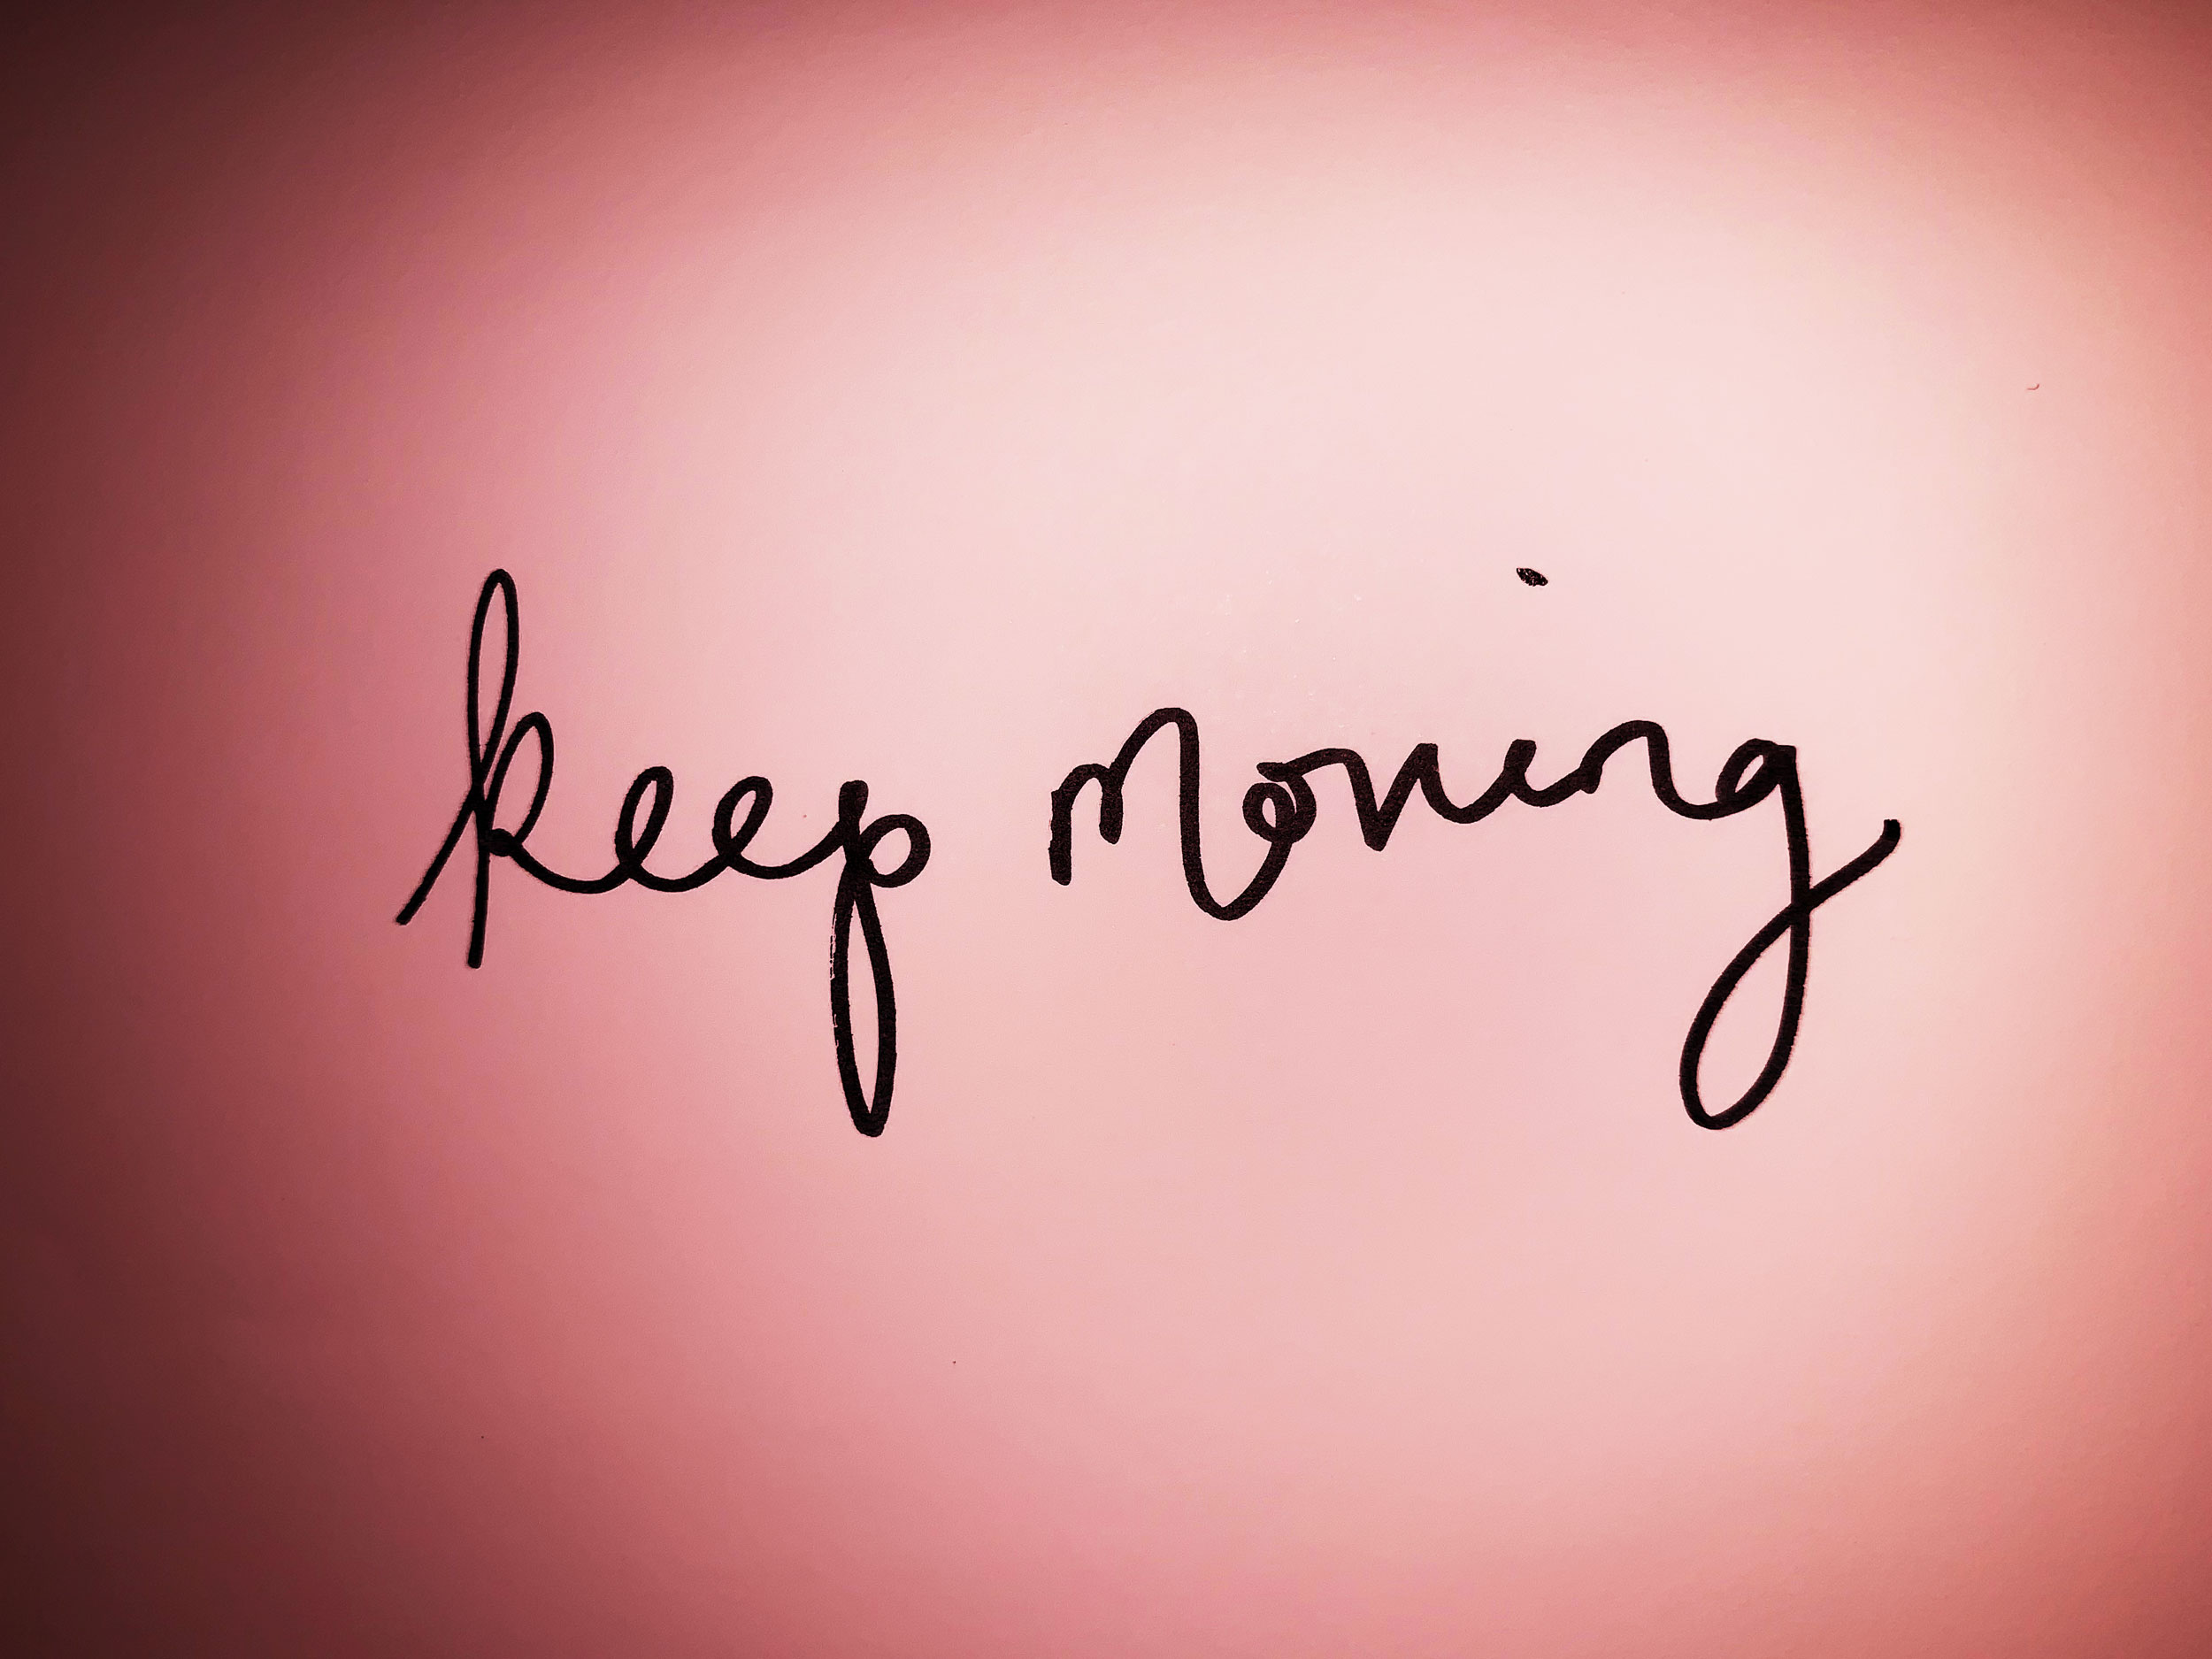 Keep moving. Drawing Luke Hockley.